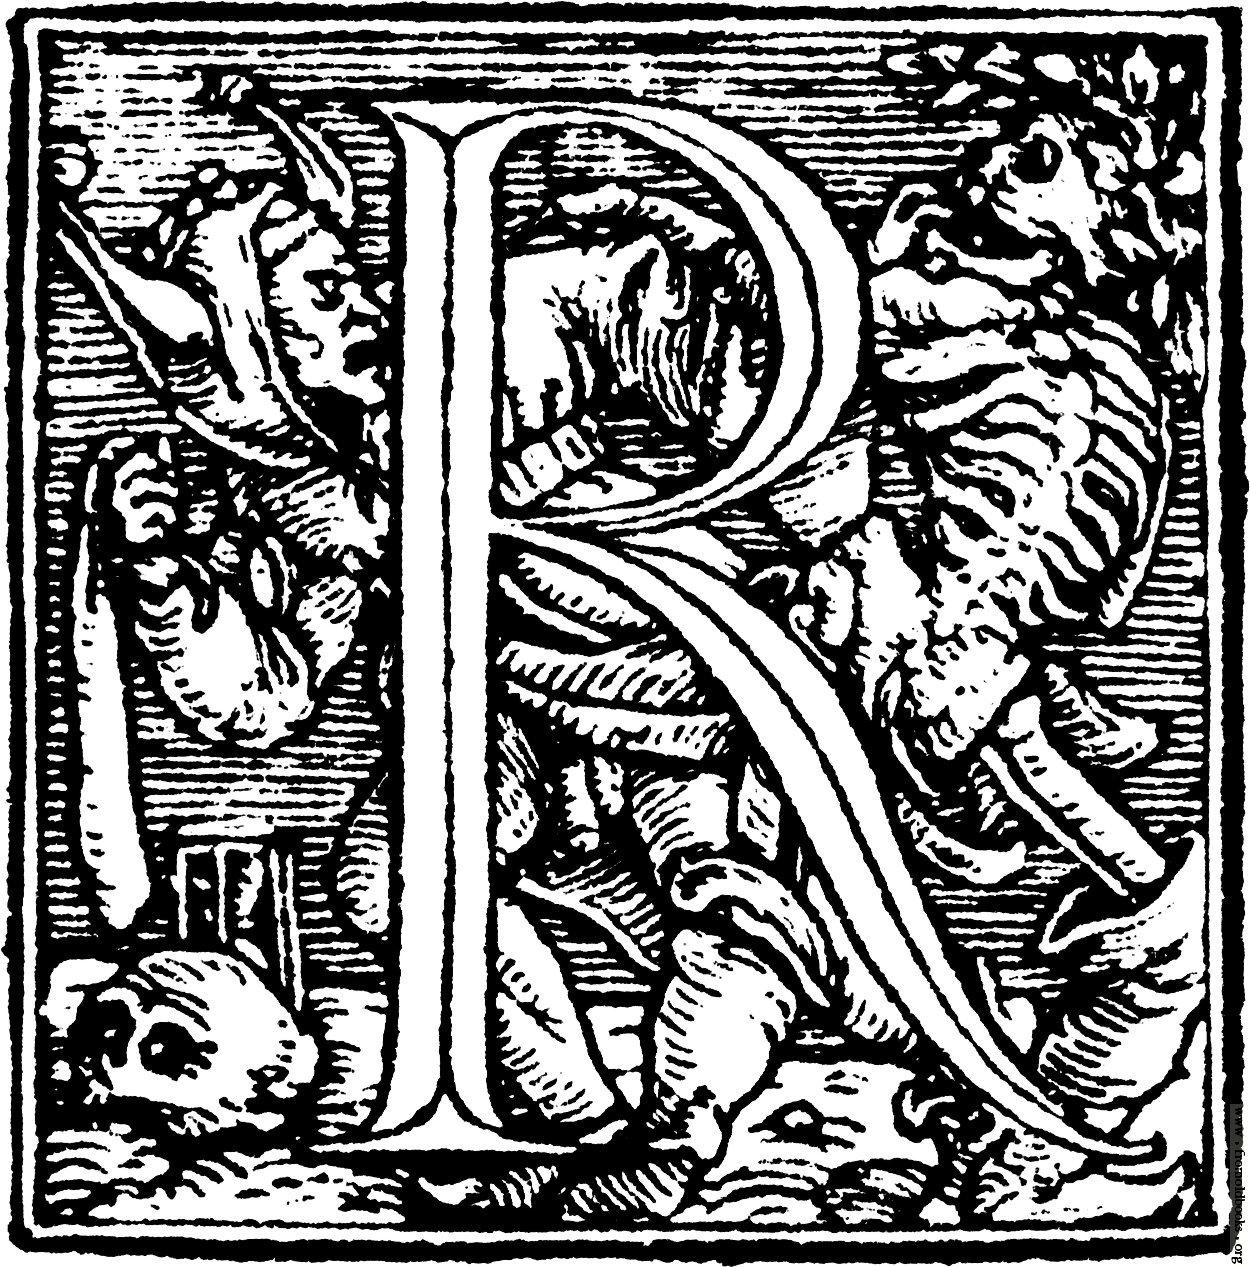 Fig 3. Hans Holbein, Dance of Death Alphabet, 1523.